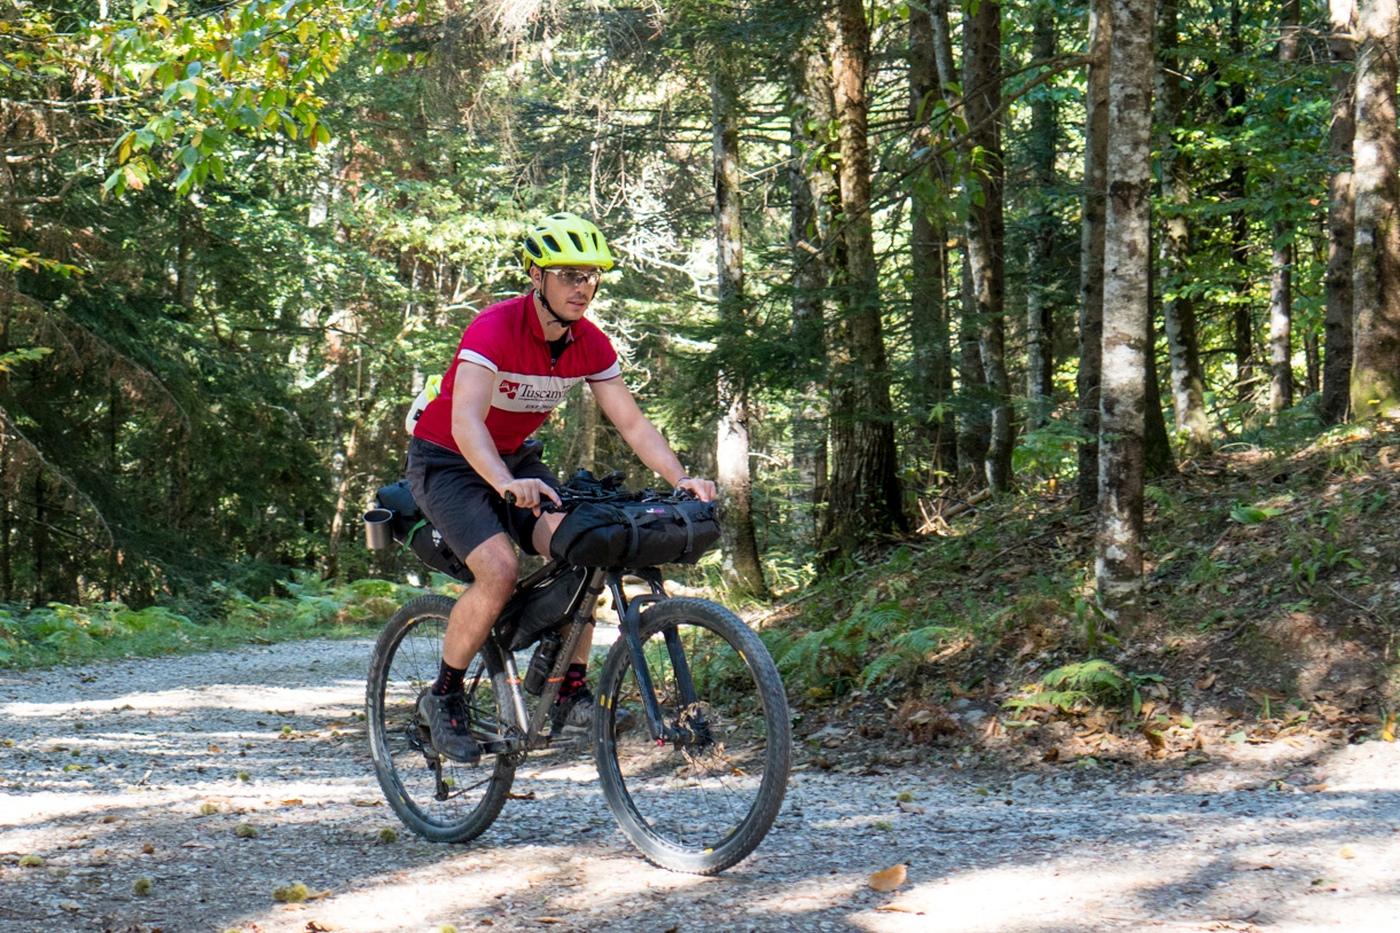 pratomagno_bikepacking-11